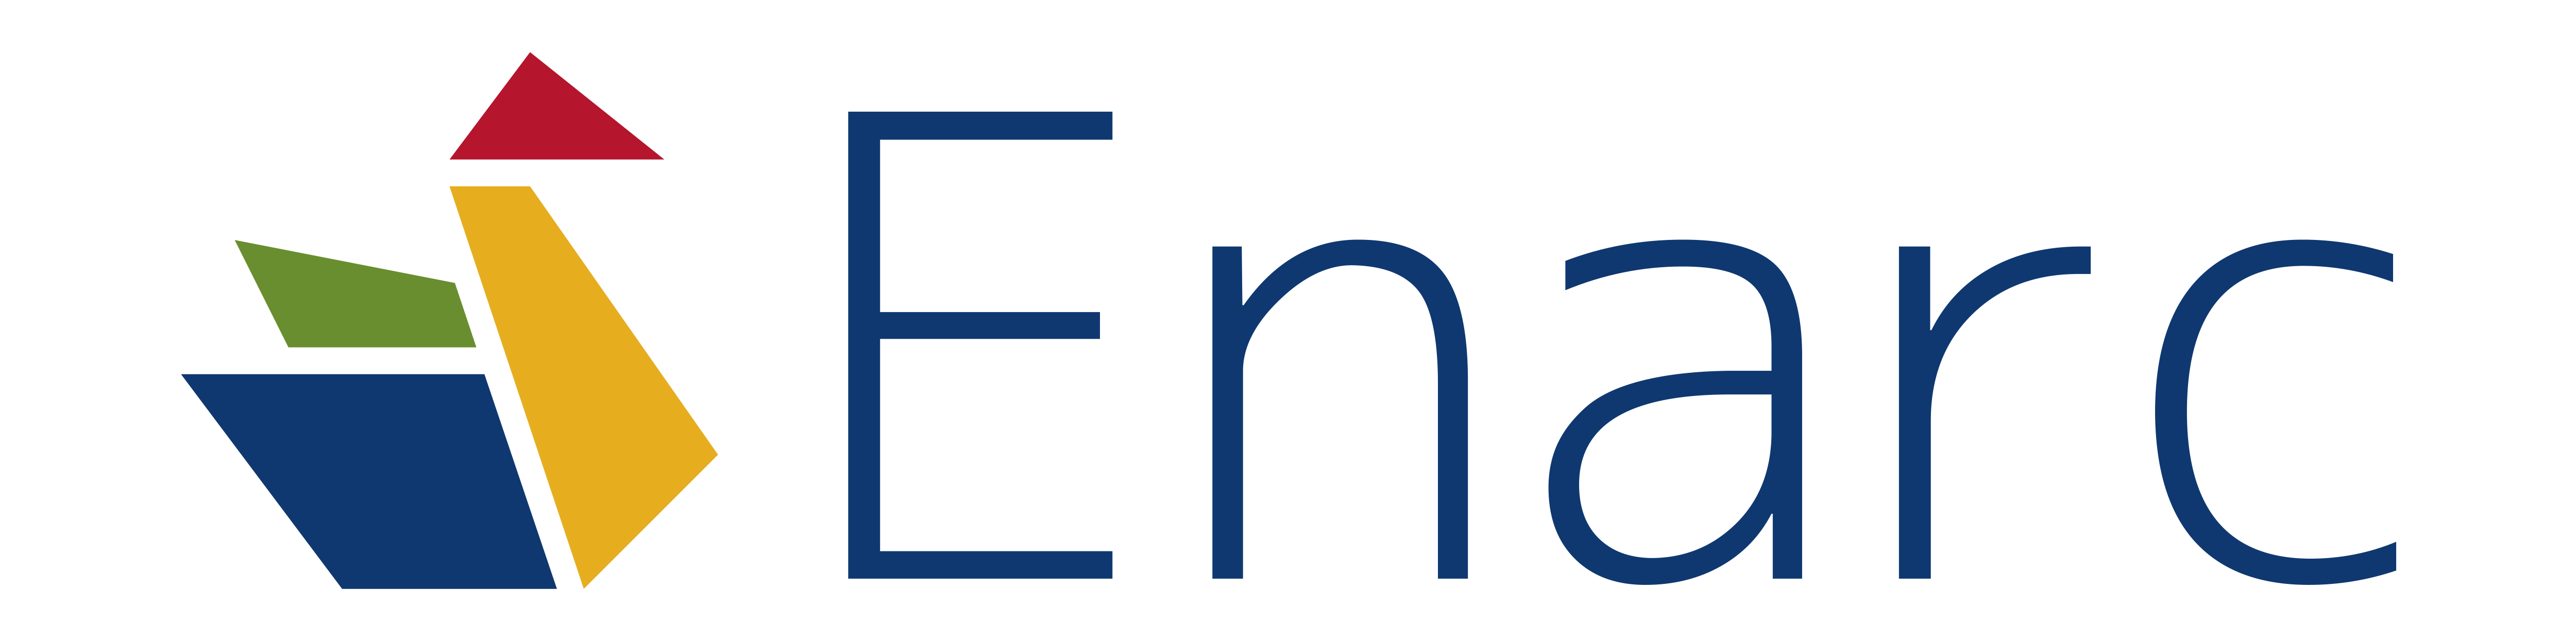 Enarc株式会社